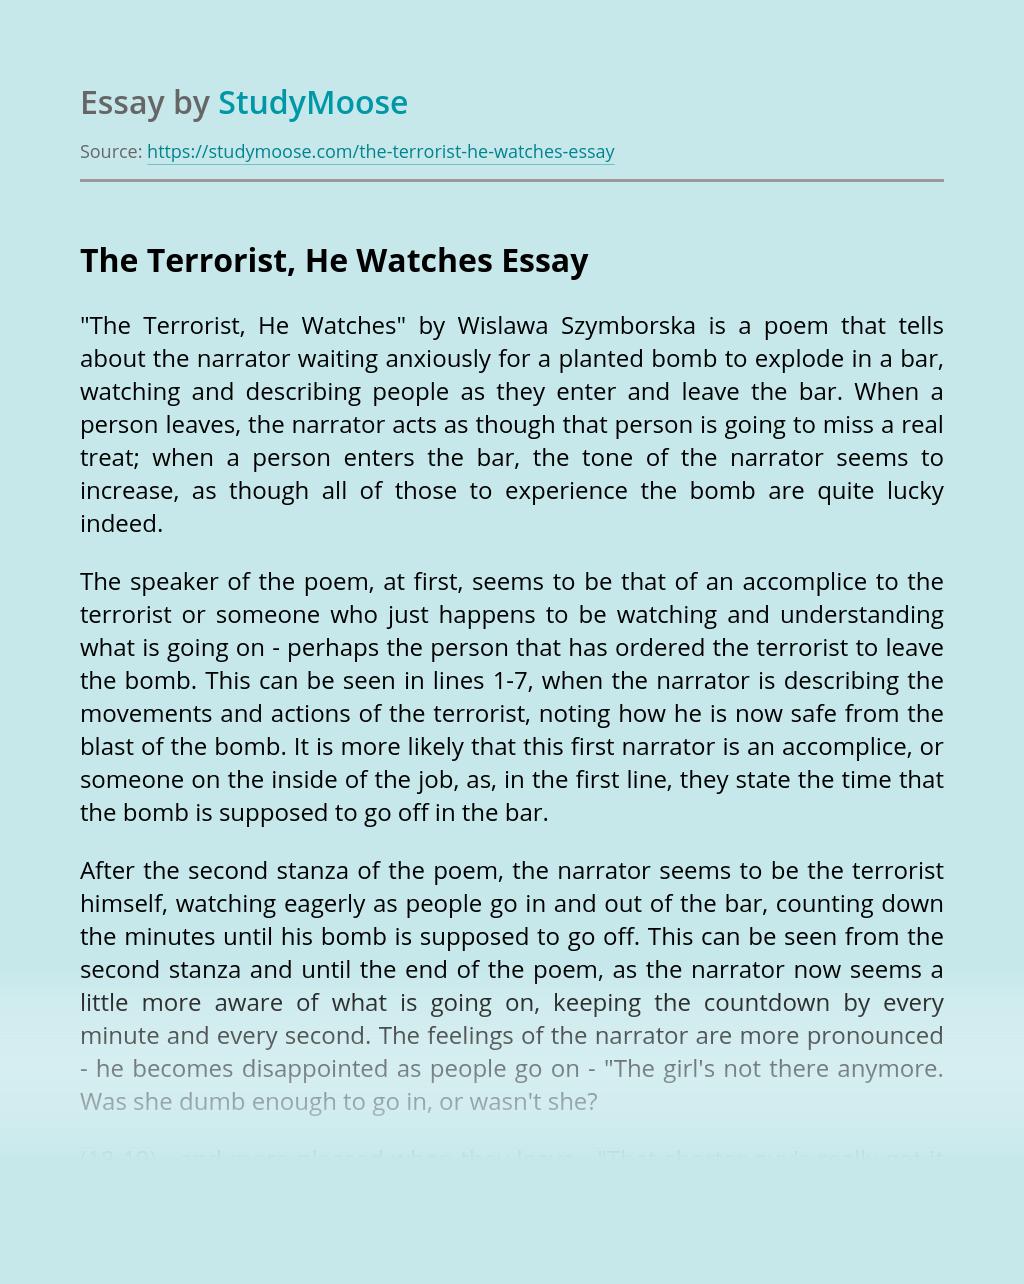 The Terrorist, He Watches